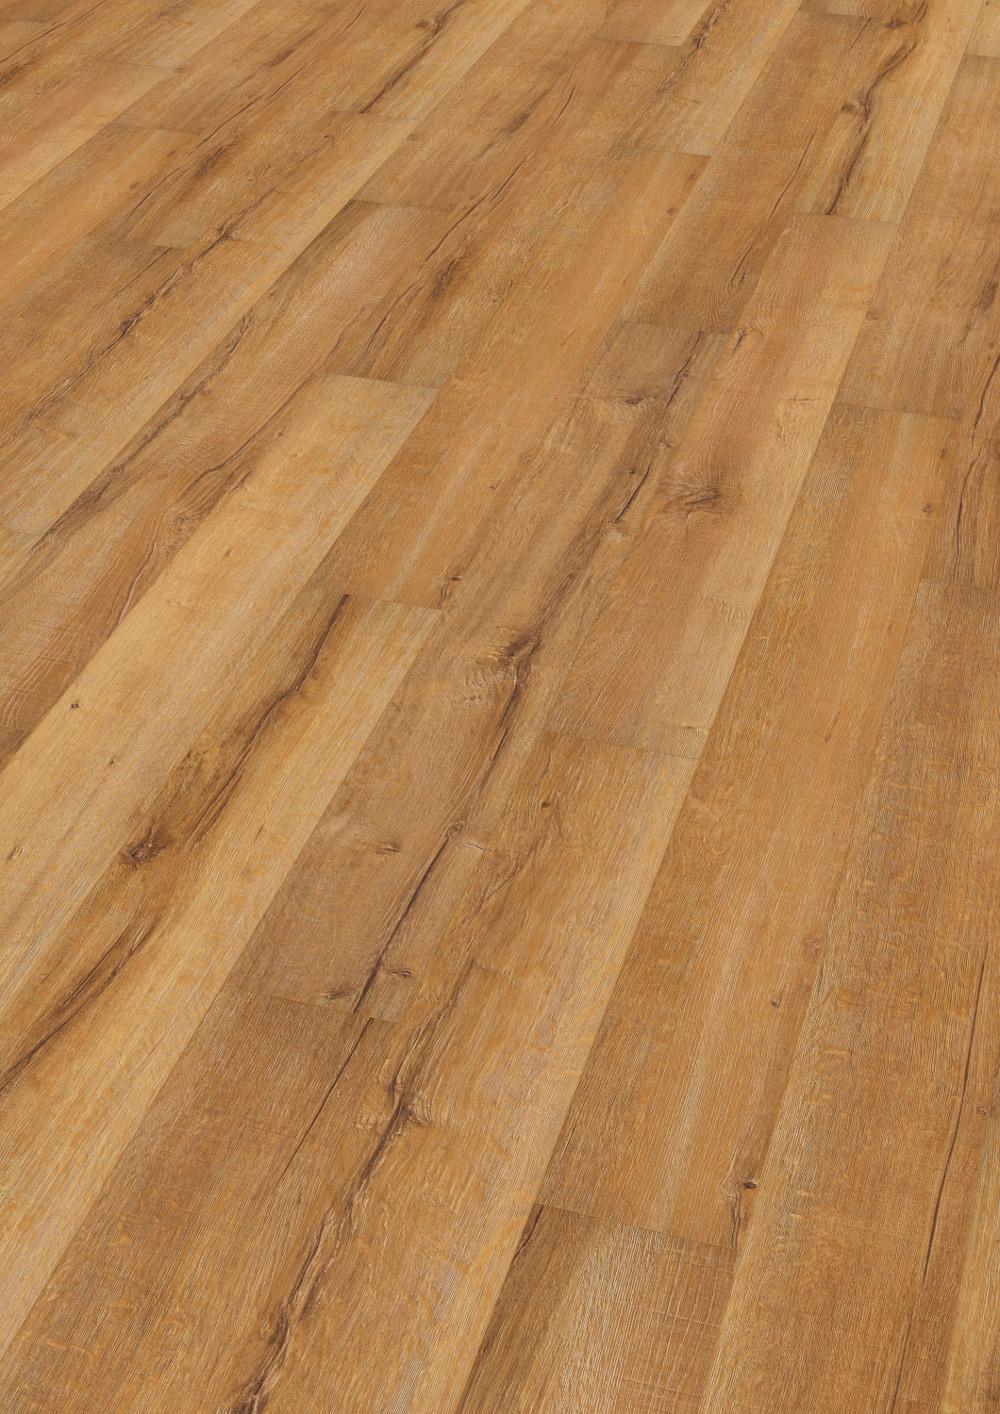 wineo laminat tirol oak honey 1 stab wineo 500 small v4. Black Bedroom Furniture Sets. Home Design Ideas